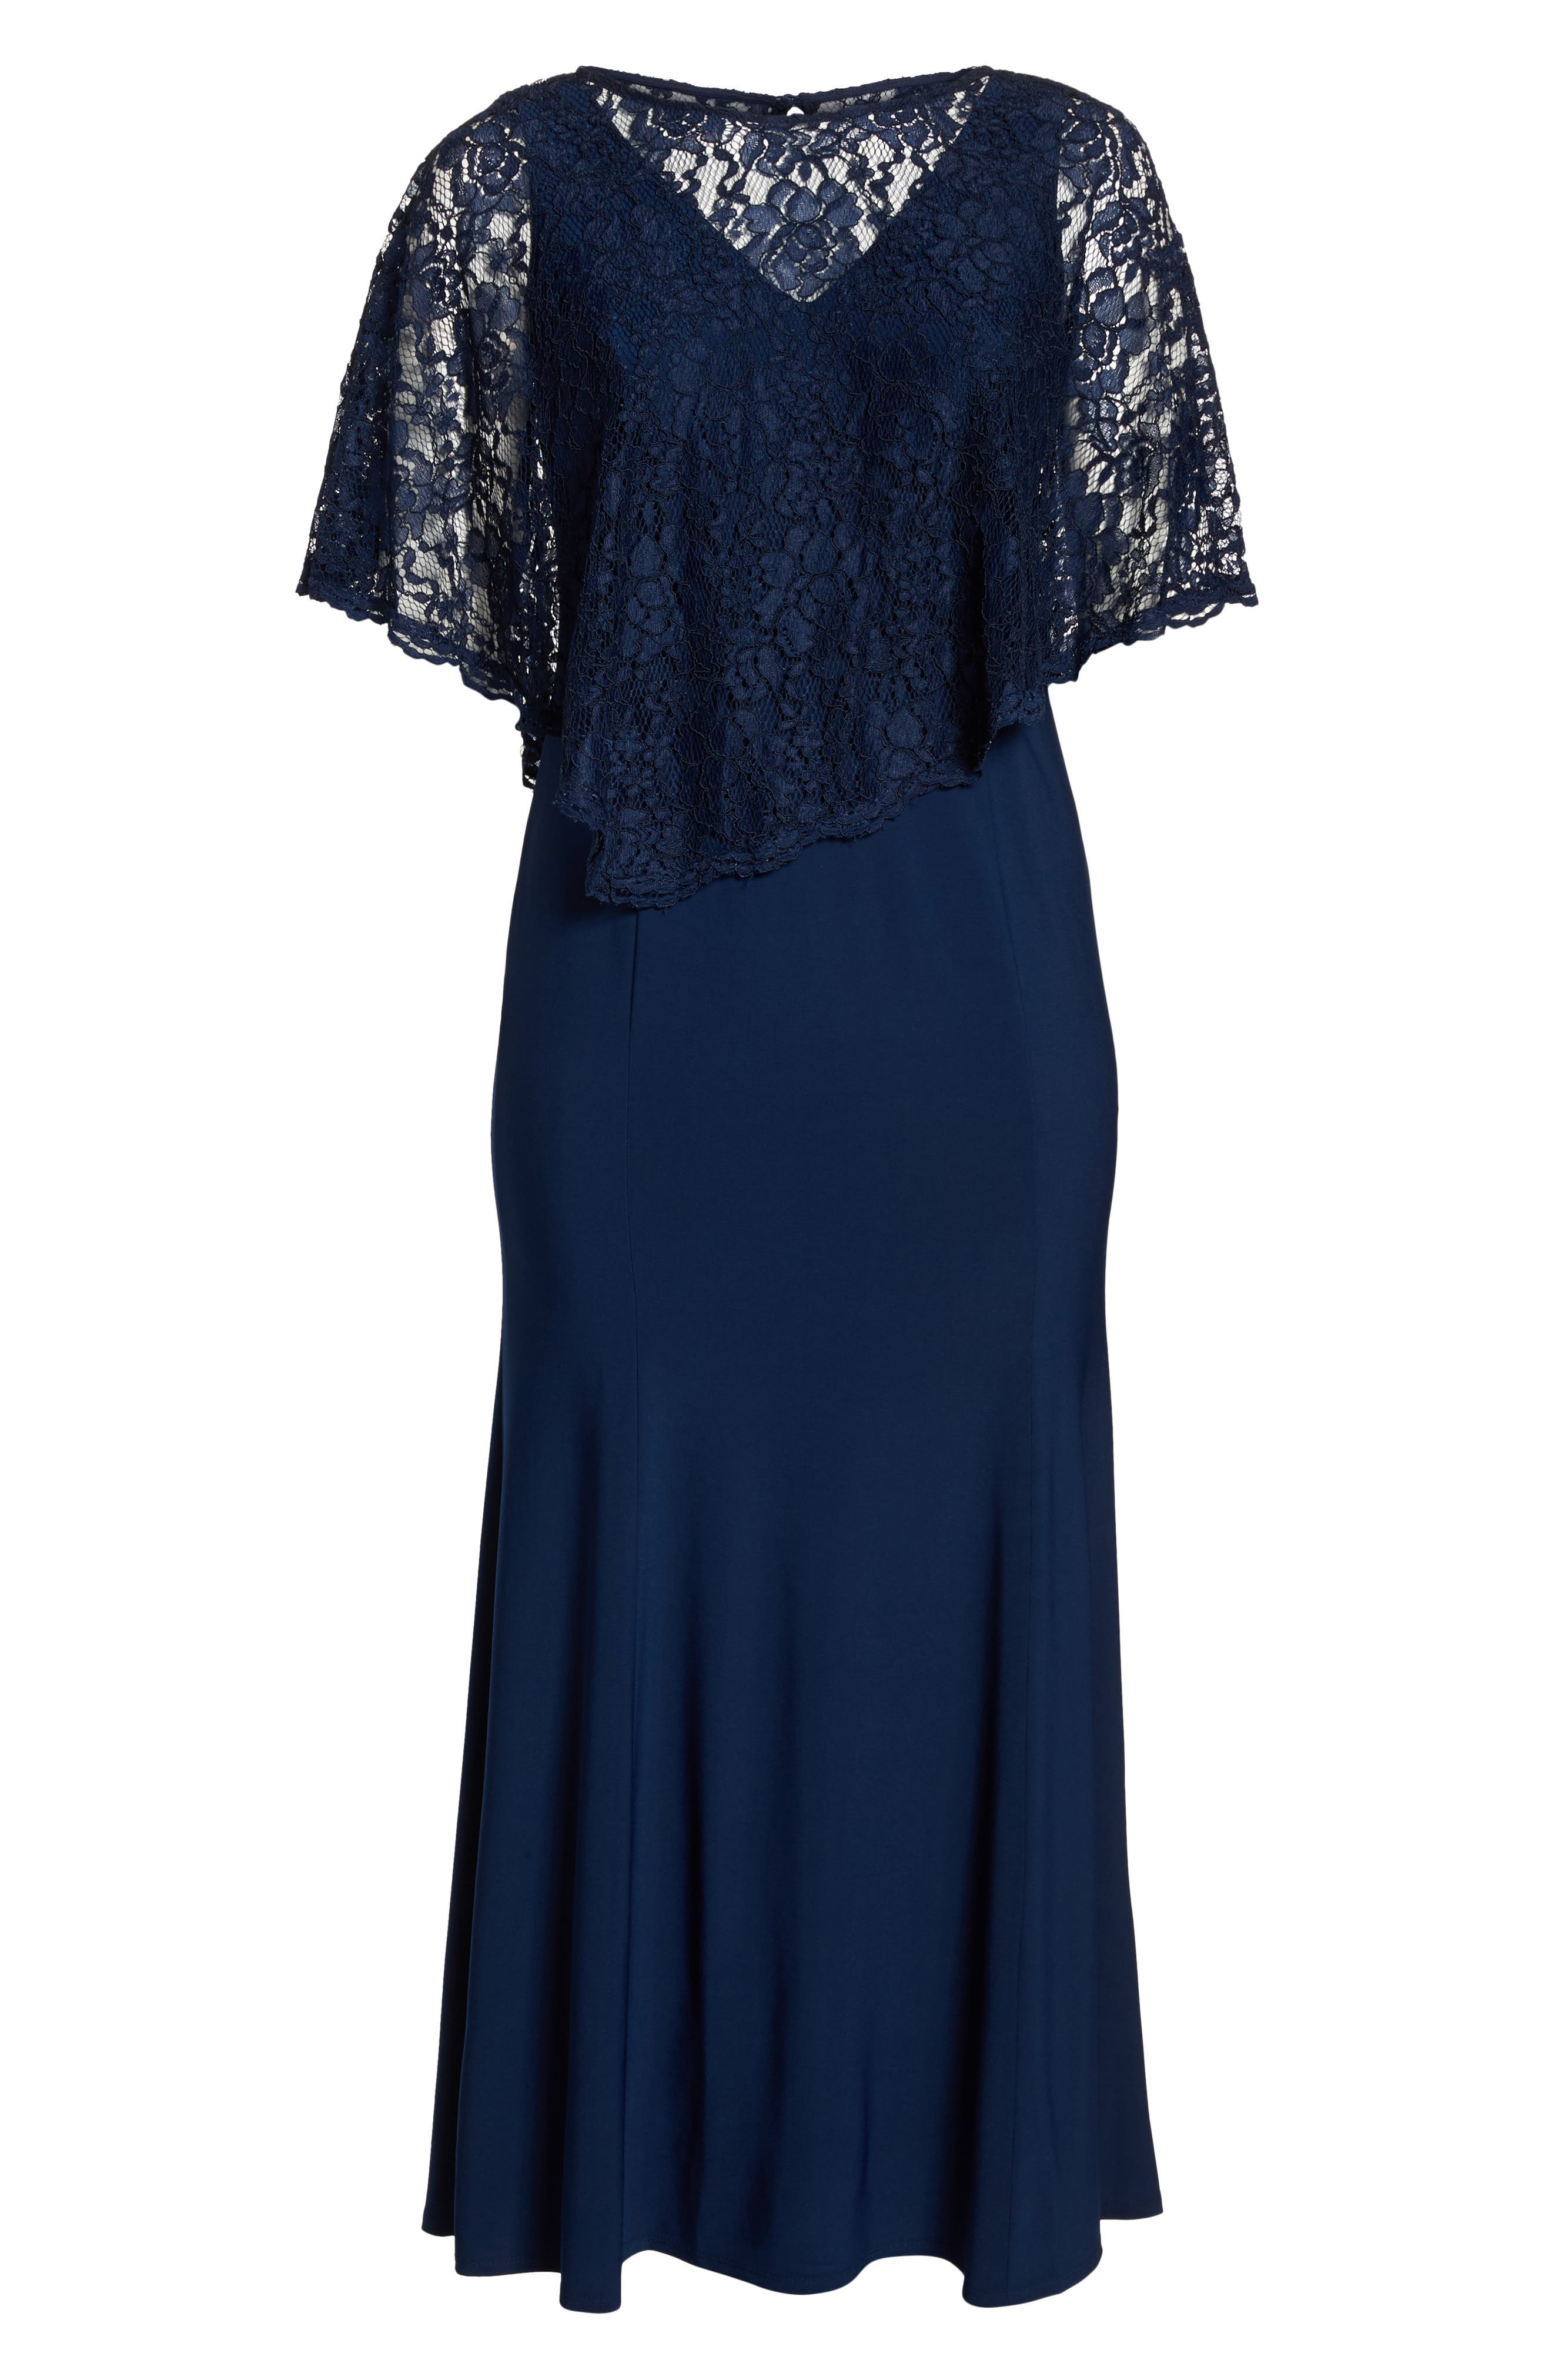 Lace Poncho Dress,                             Alternate thumbnail 6, color,                             NAVY